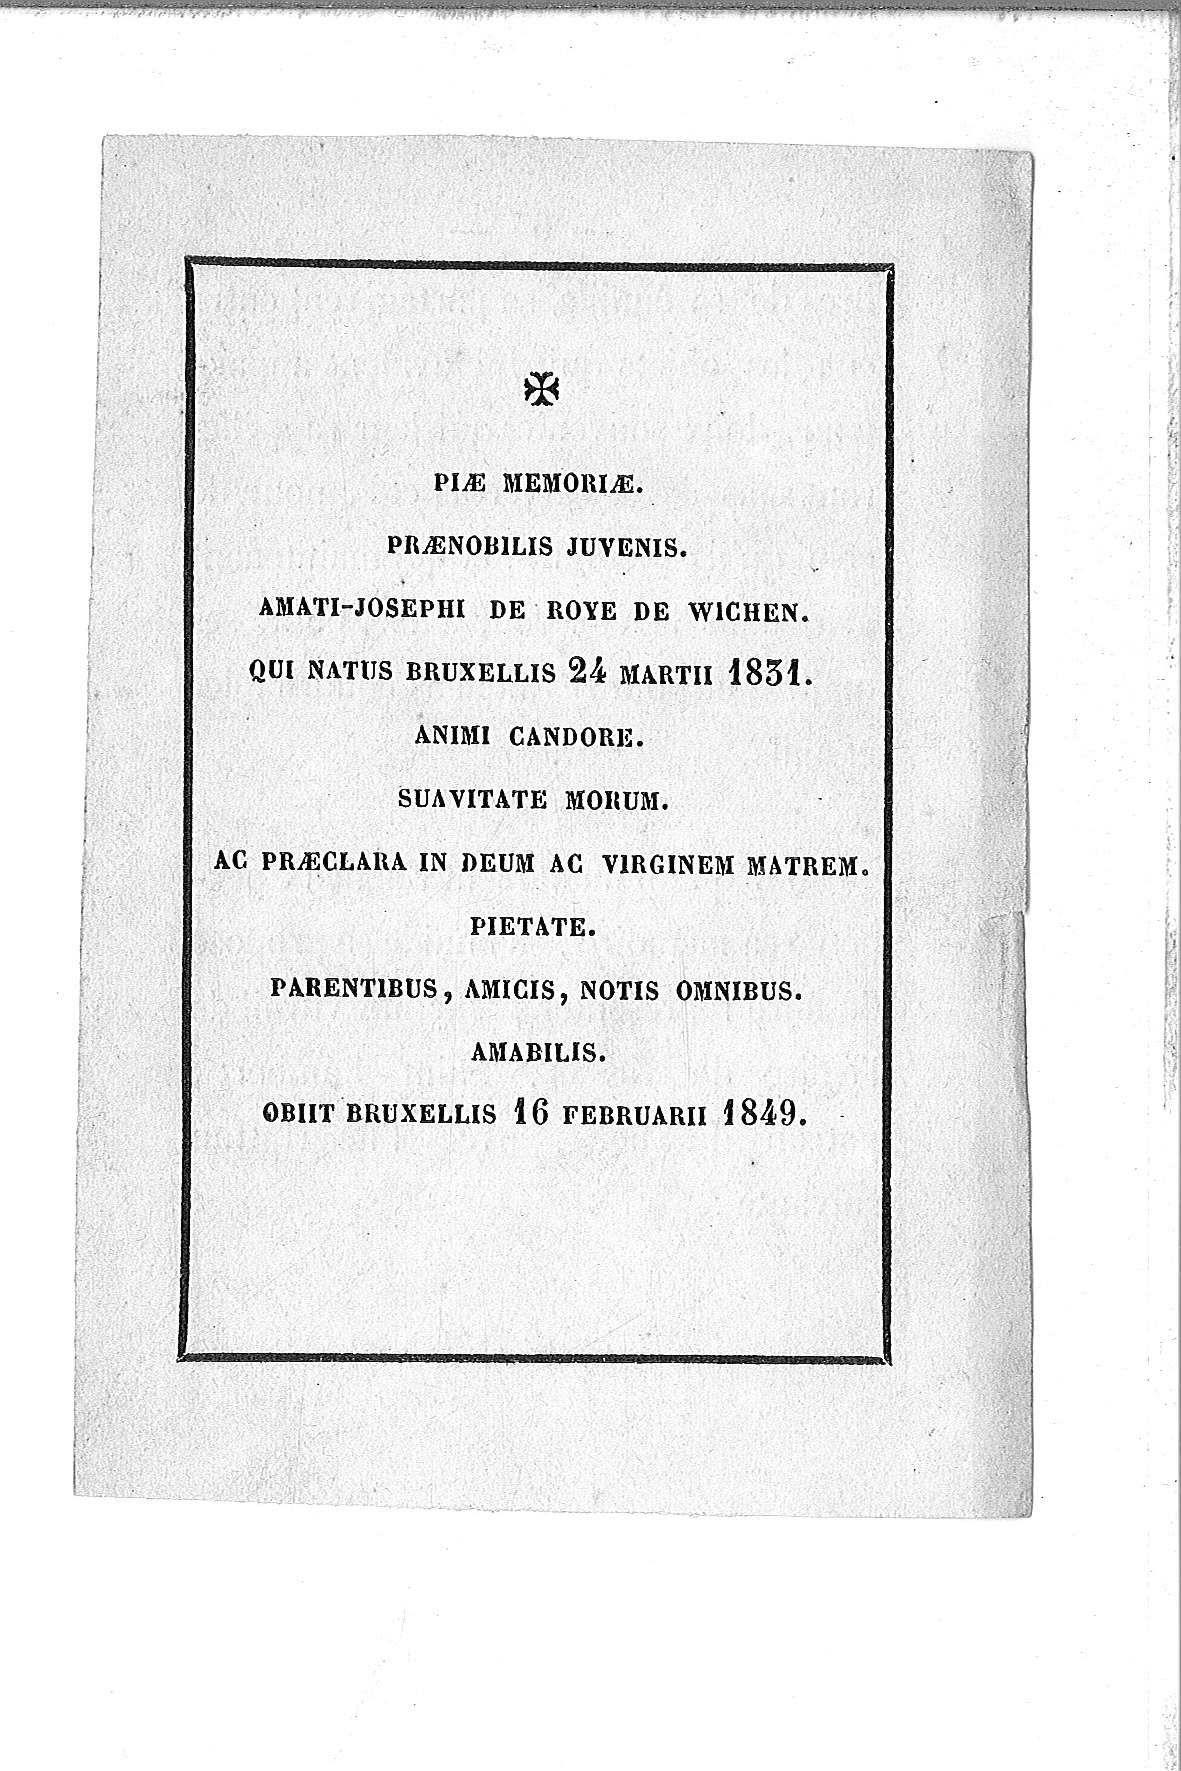 Amati-Josephi-(1849)-20121030151803_00064.jpg